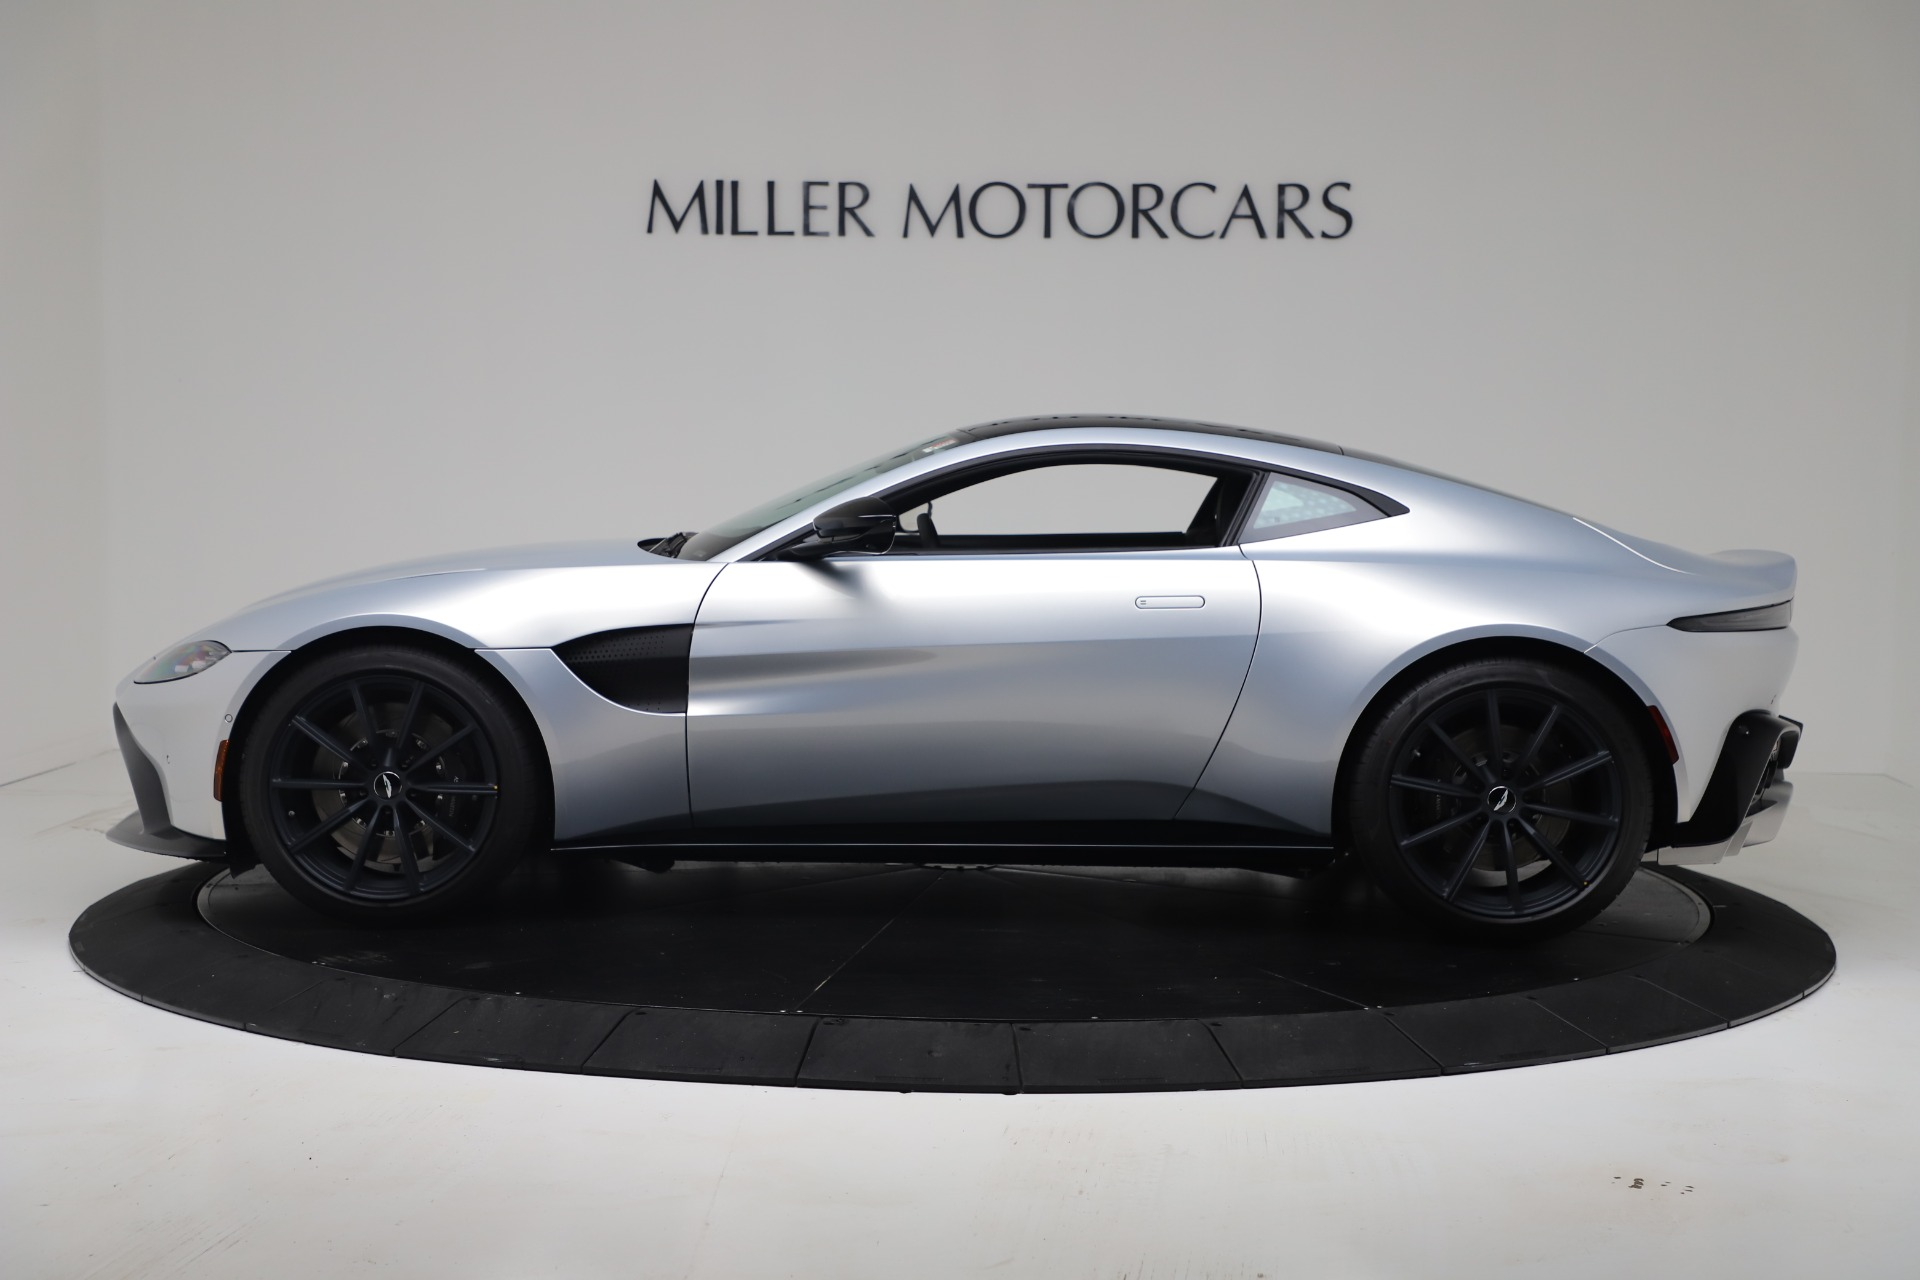 New 2020 Aston Martin Vantage V8 For Sale In Westport, CT 3481_p24